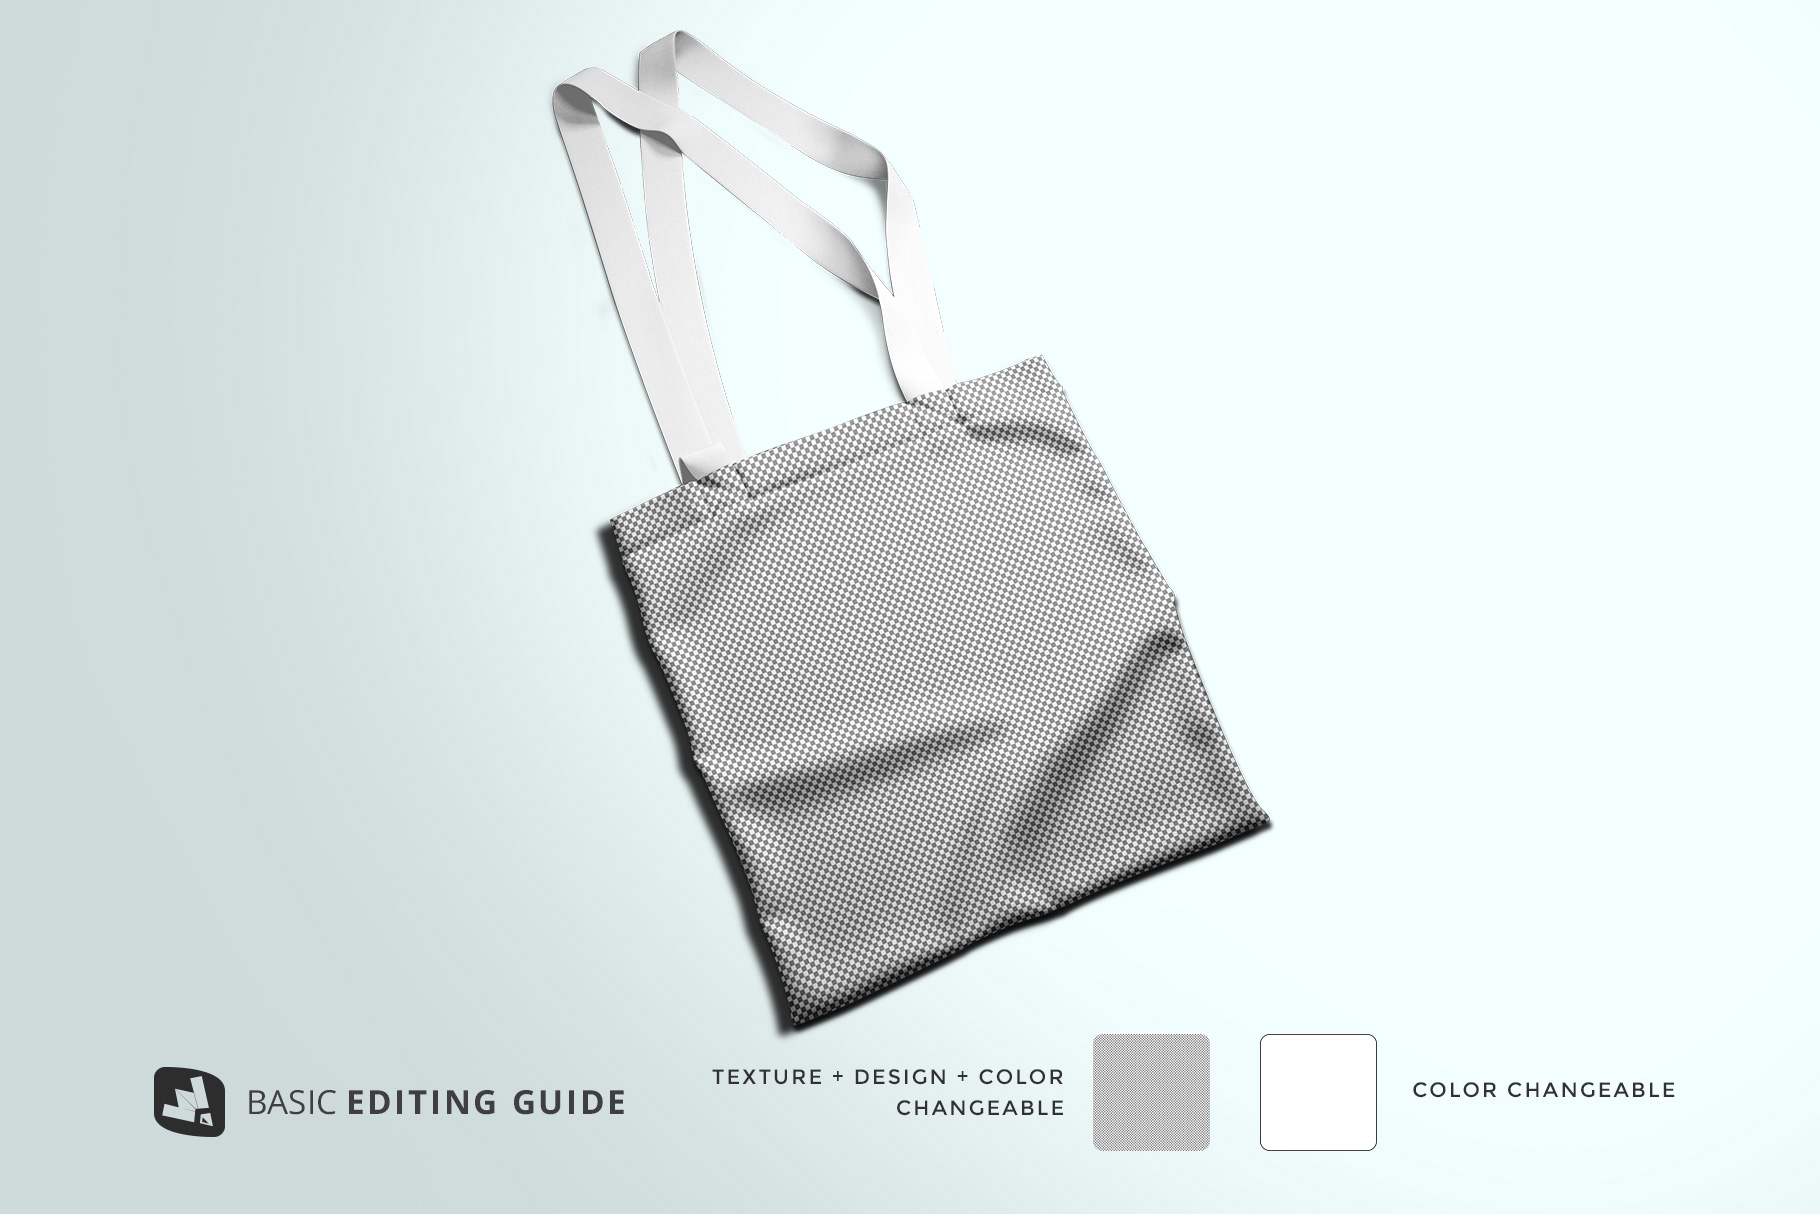 editability of the topview reusable cotton bag mockup